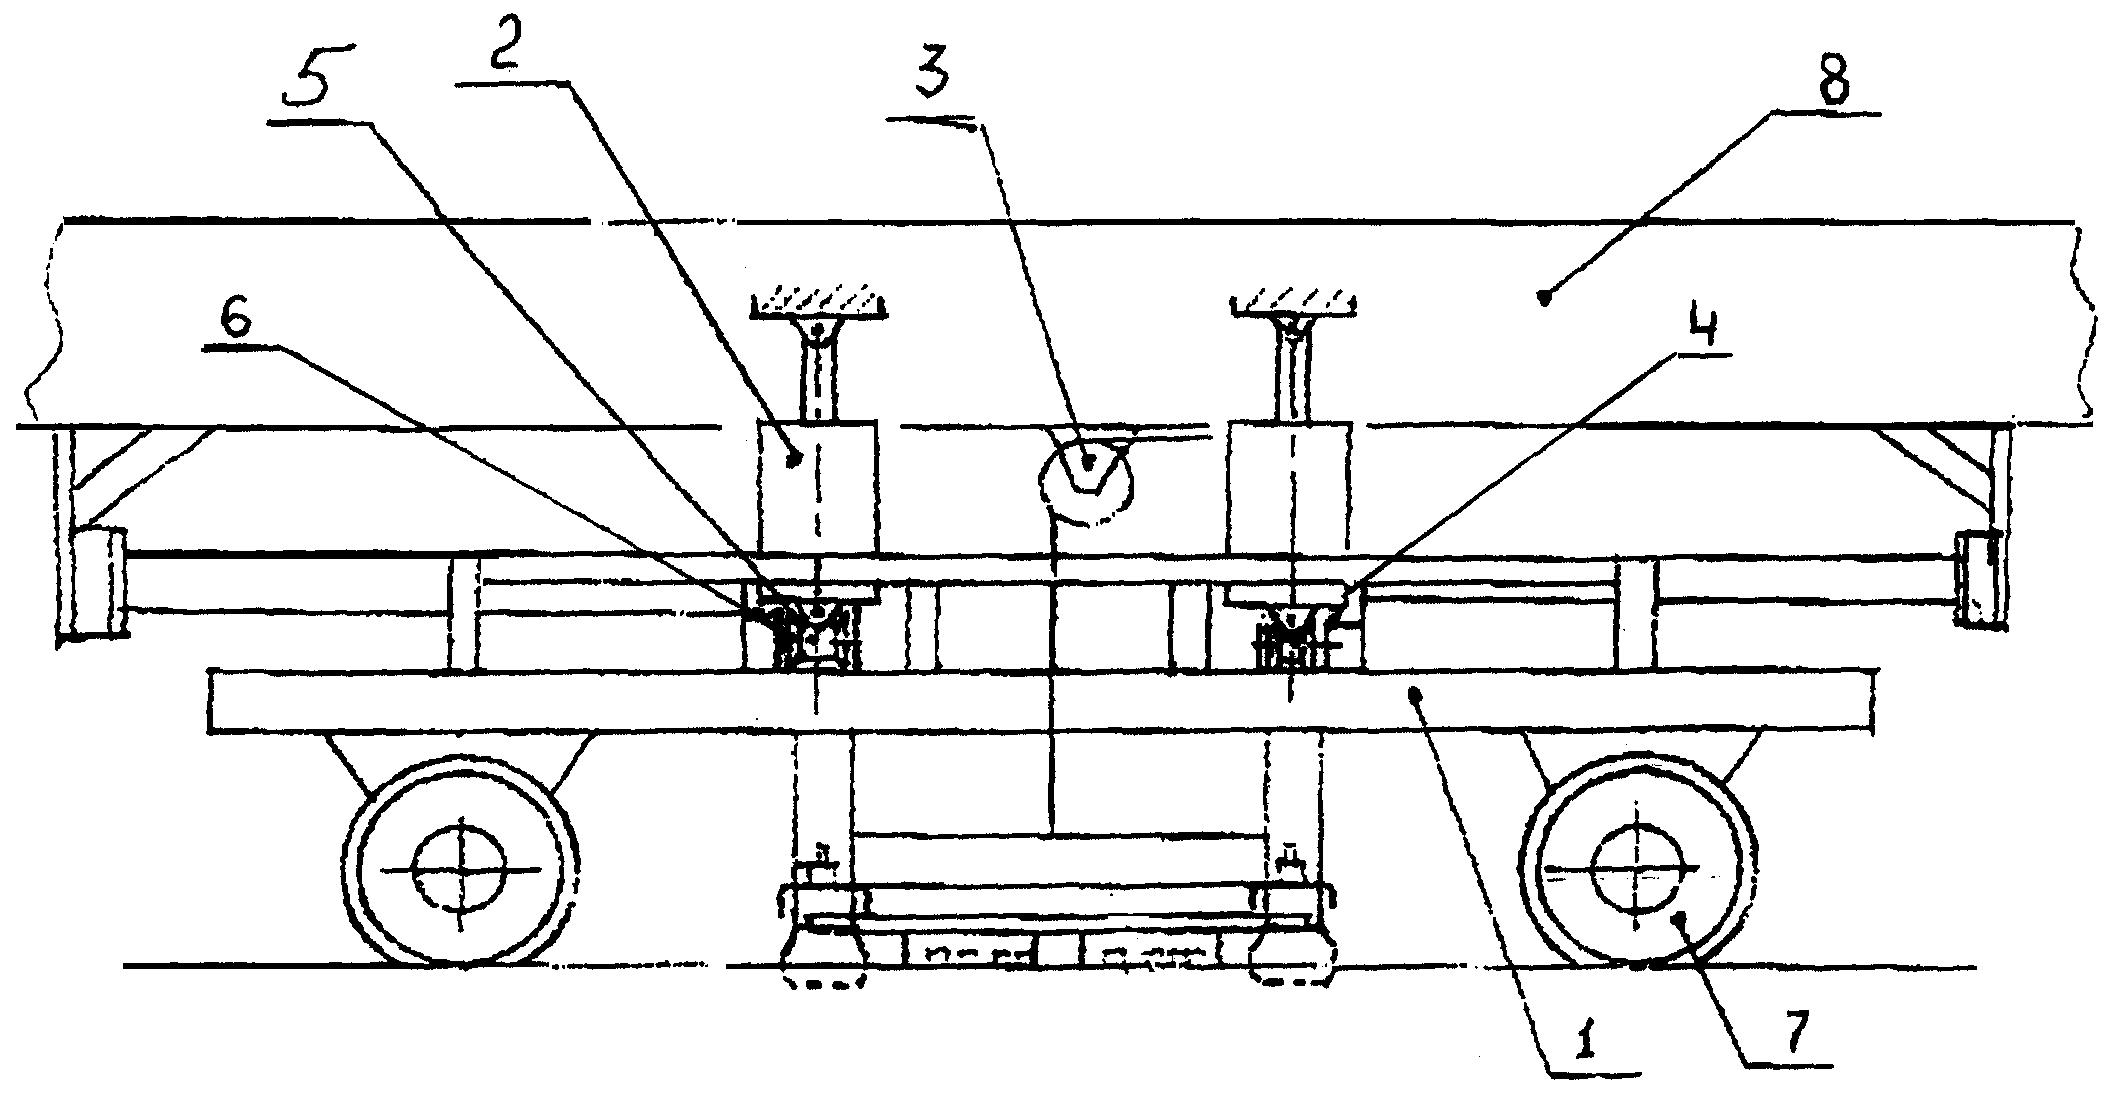 RU37345U1 - Autonomous suspension defectoscopic trolley - Google Patents